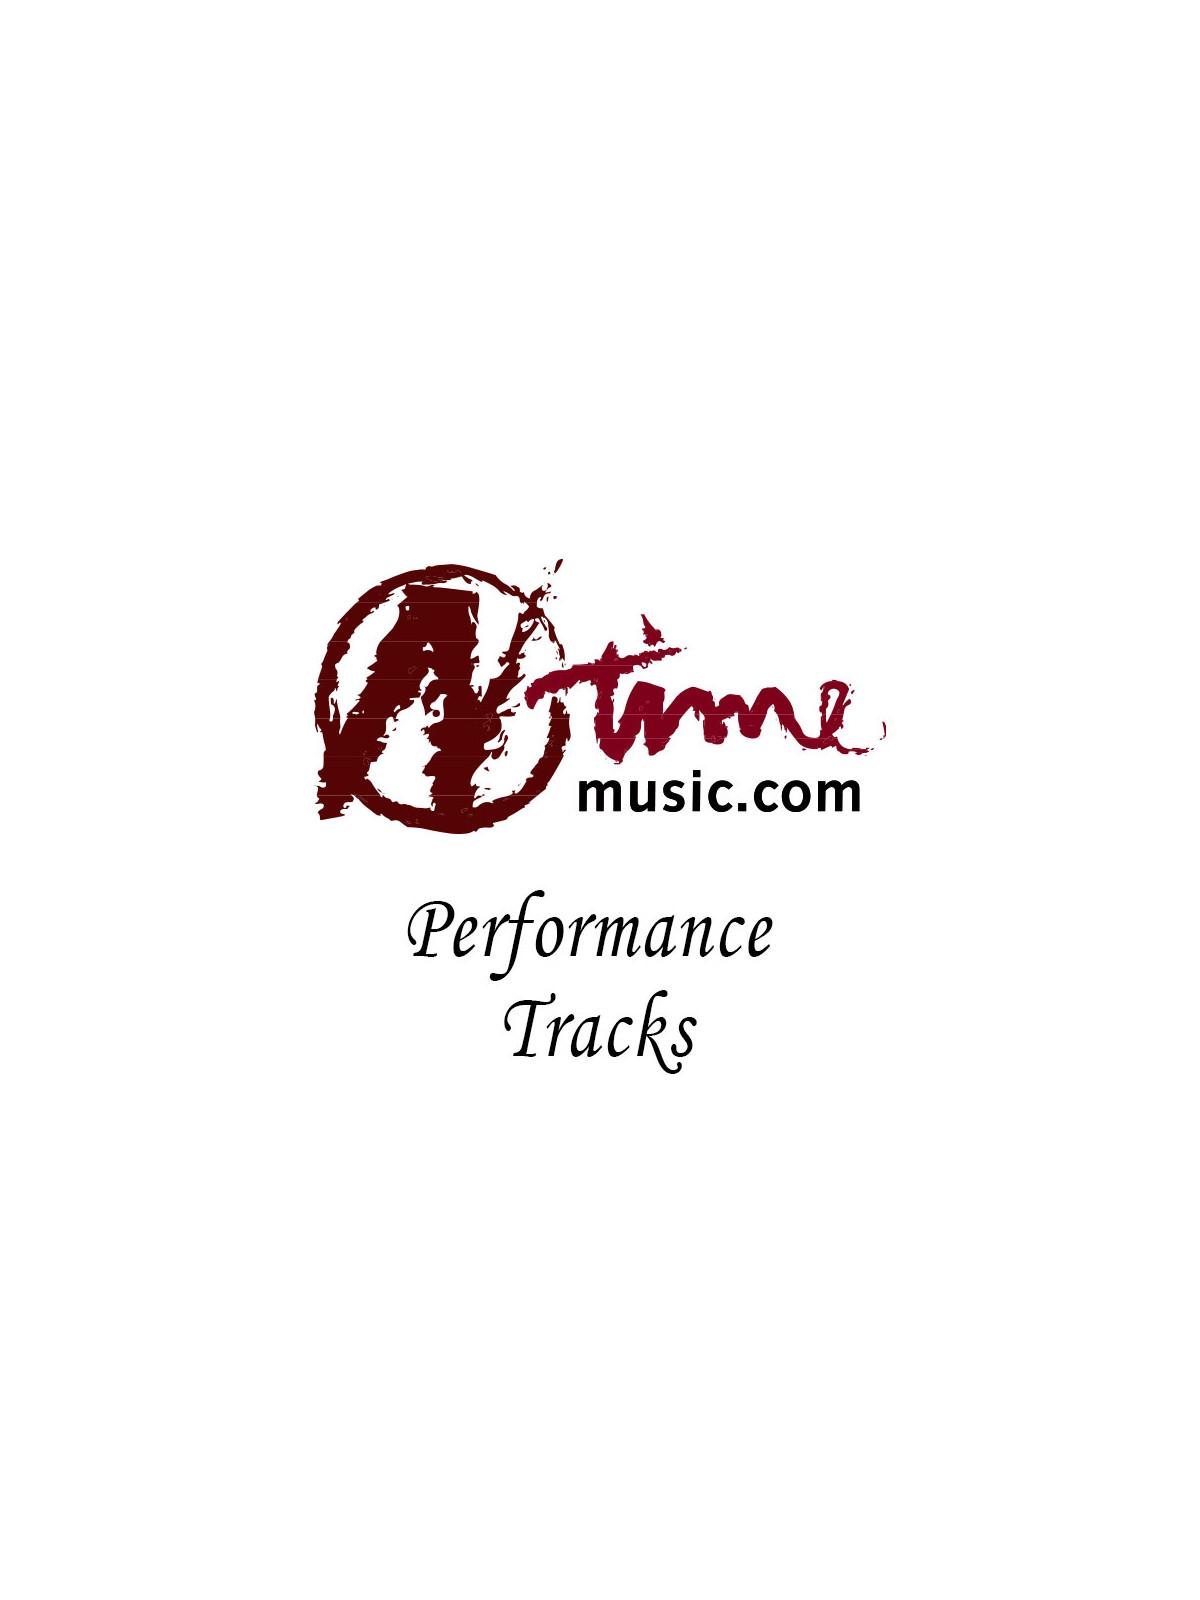 Tasha Cobbs - One Place (Live) - DVD Video